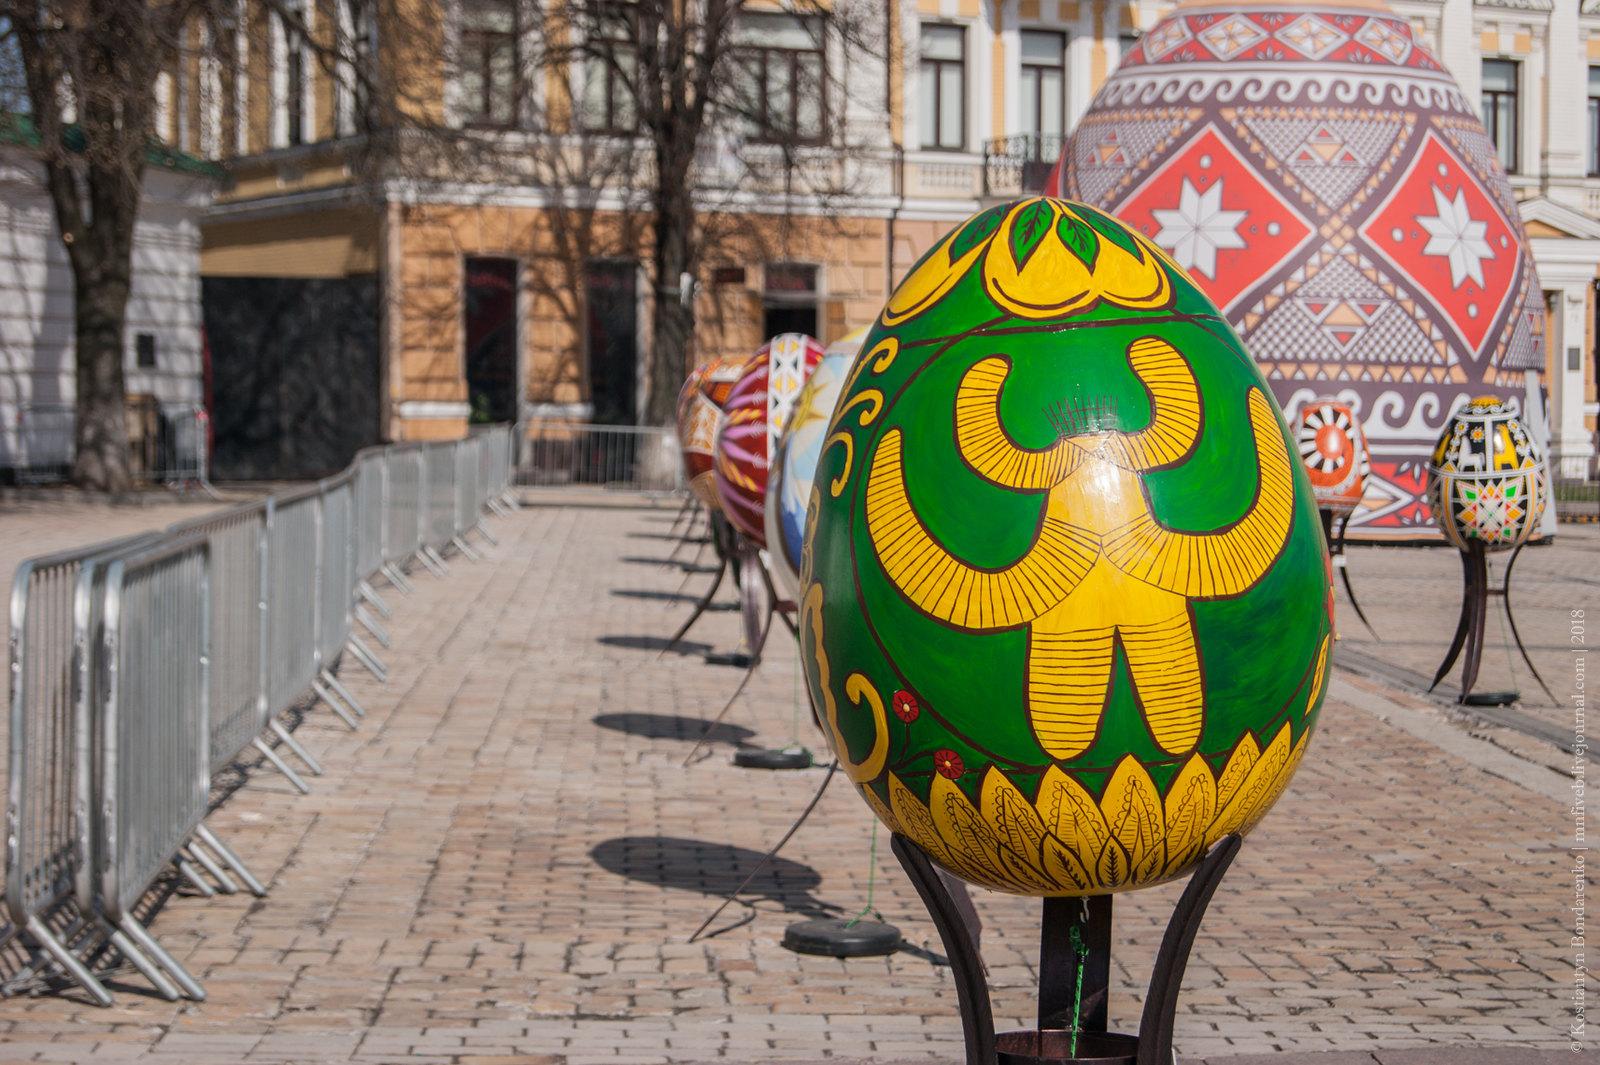 201804010 - Easter-02